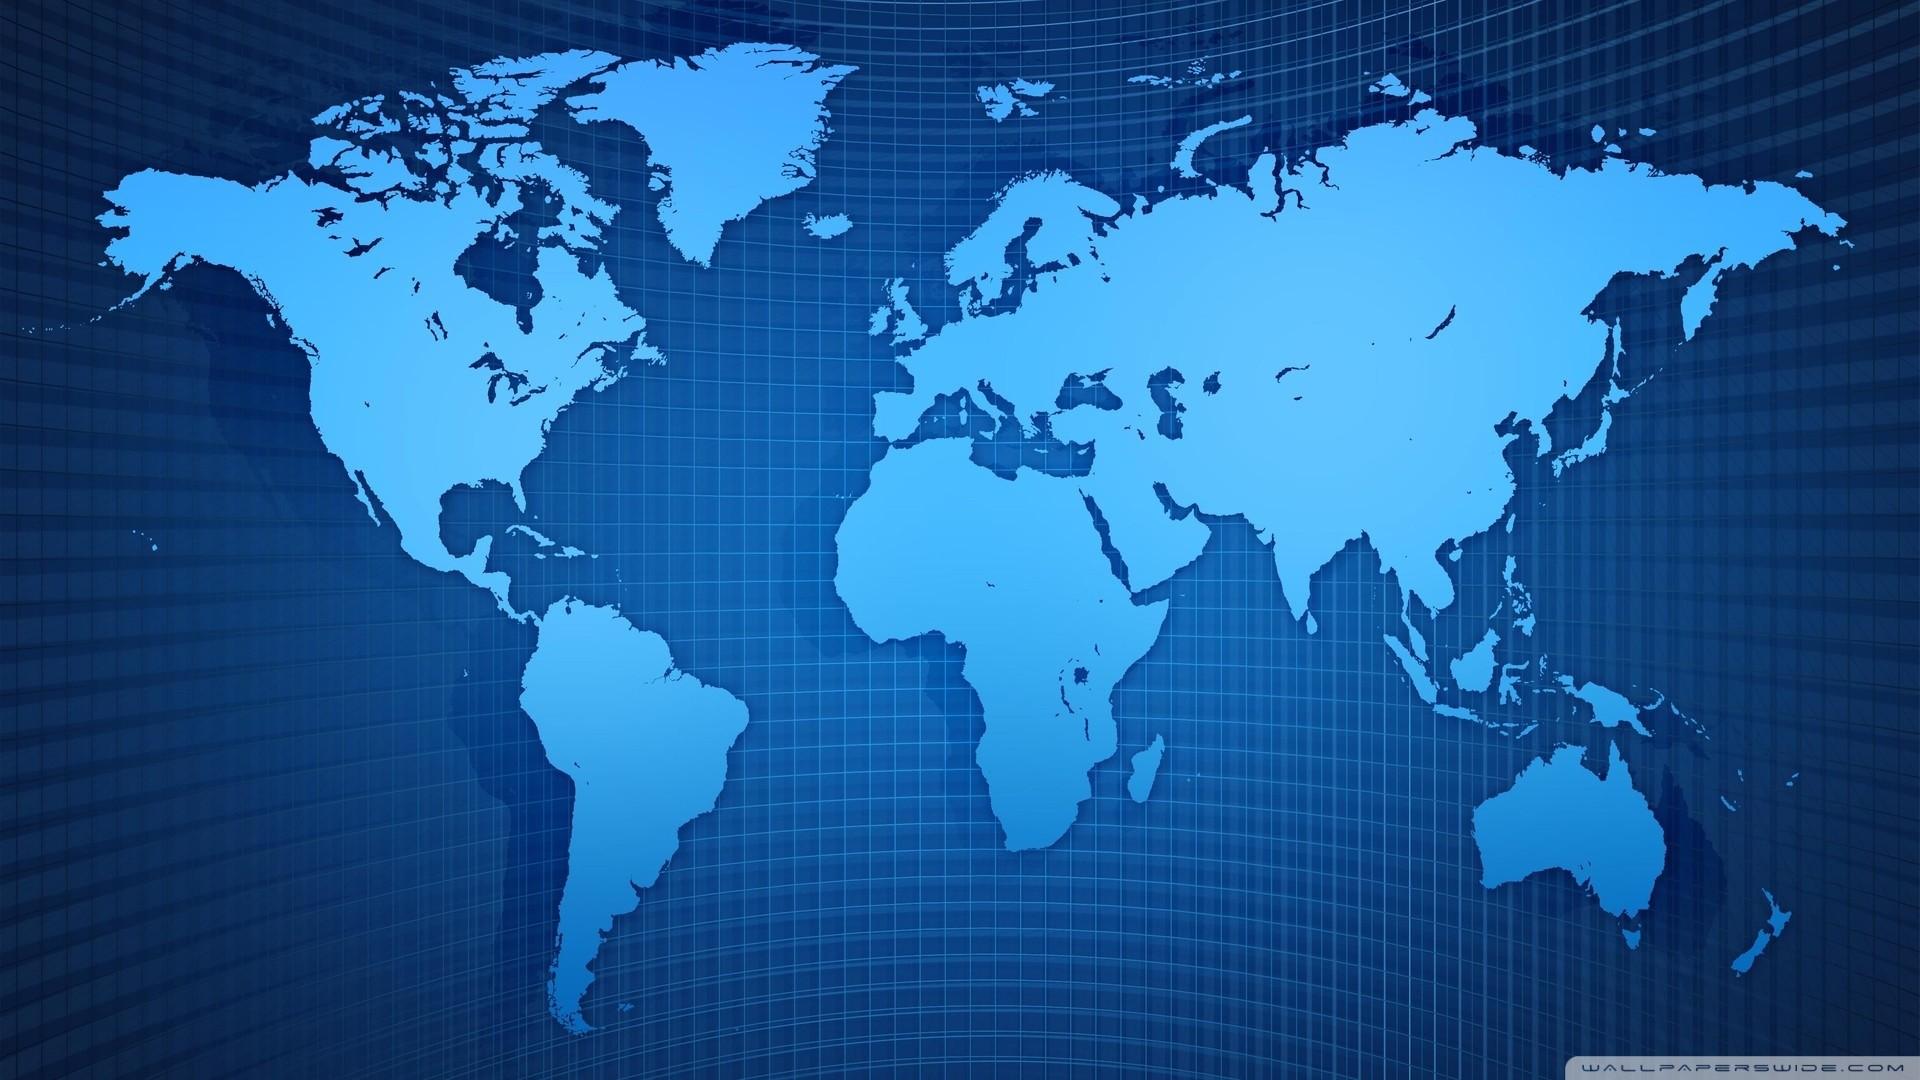 Global map wallpaper 59 images 1920x1080 world map desktop wallpaper gumiabroncs Choice Image